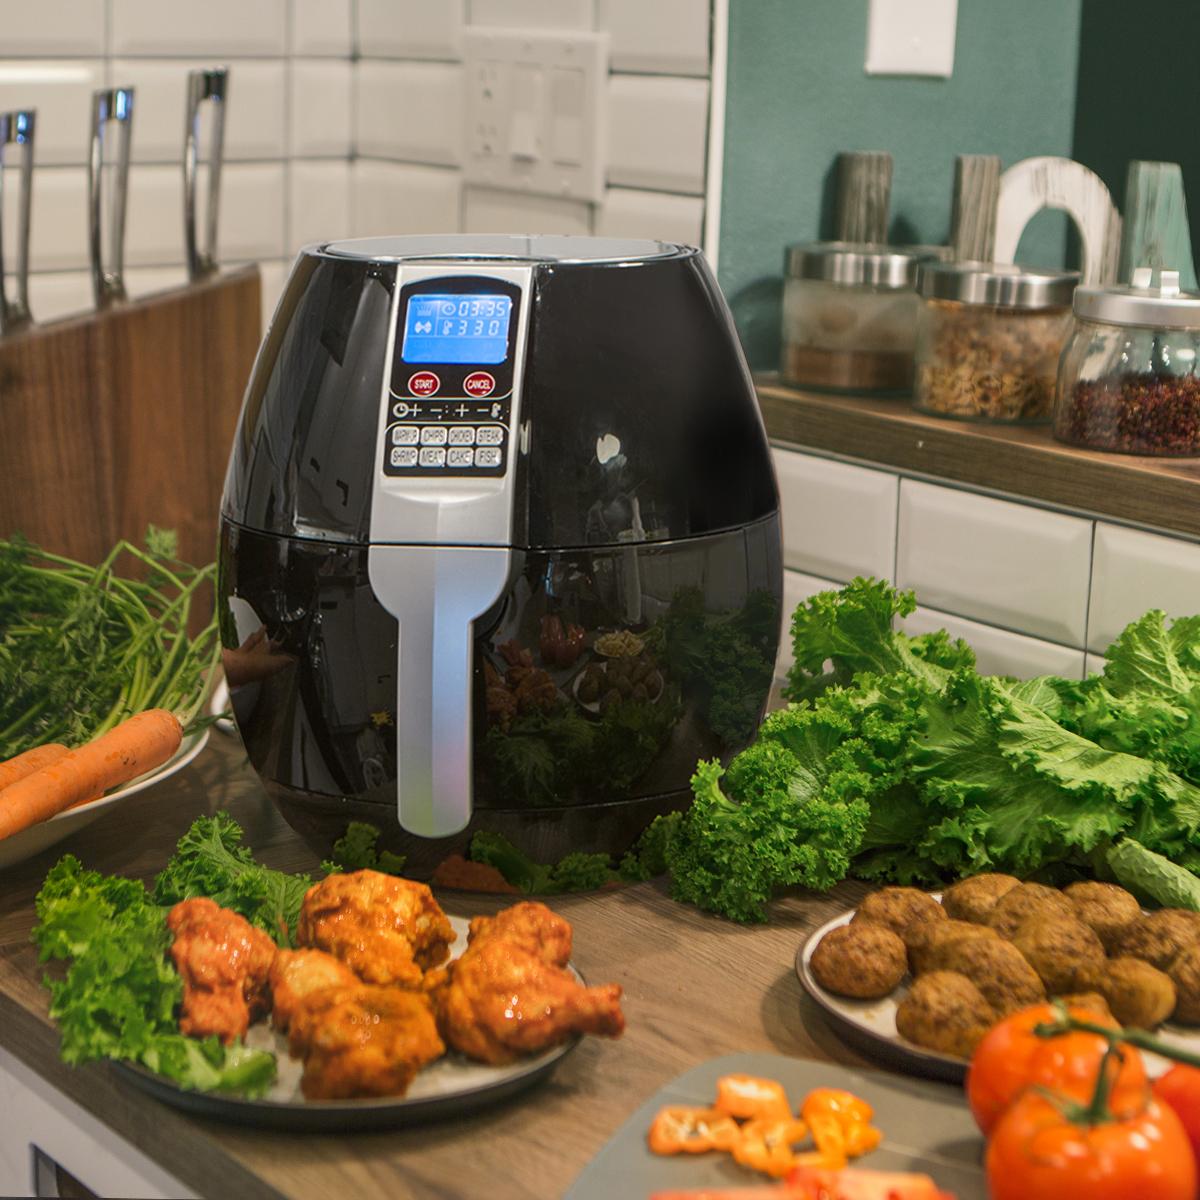 3.7QT Electric Air Fryer 8-Cooking Setting Digital LCD Display, Black